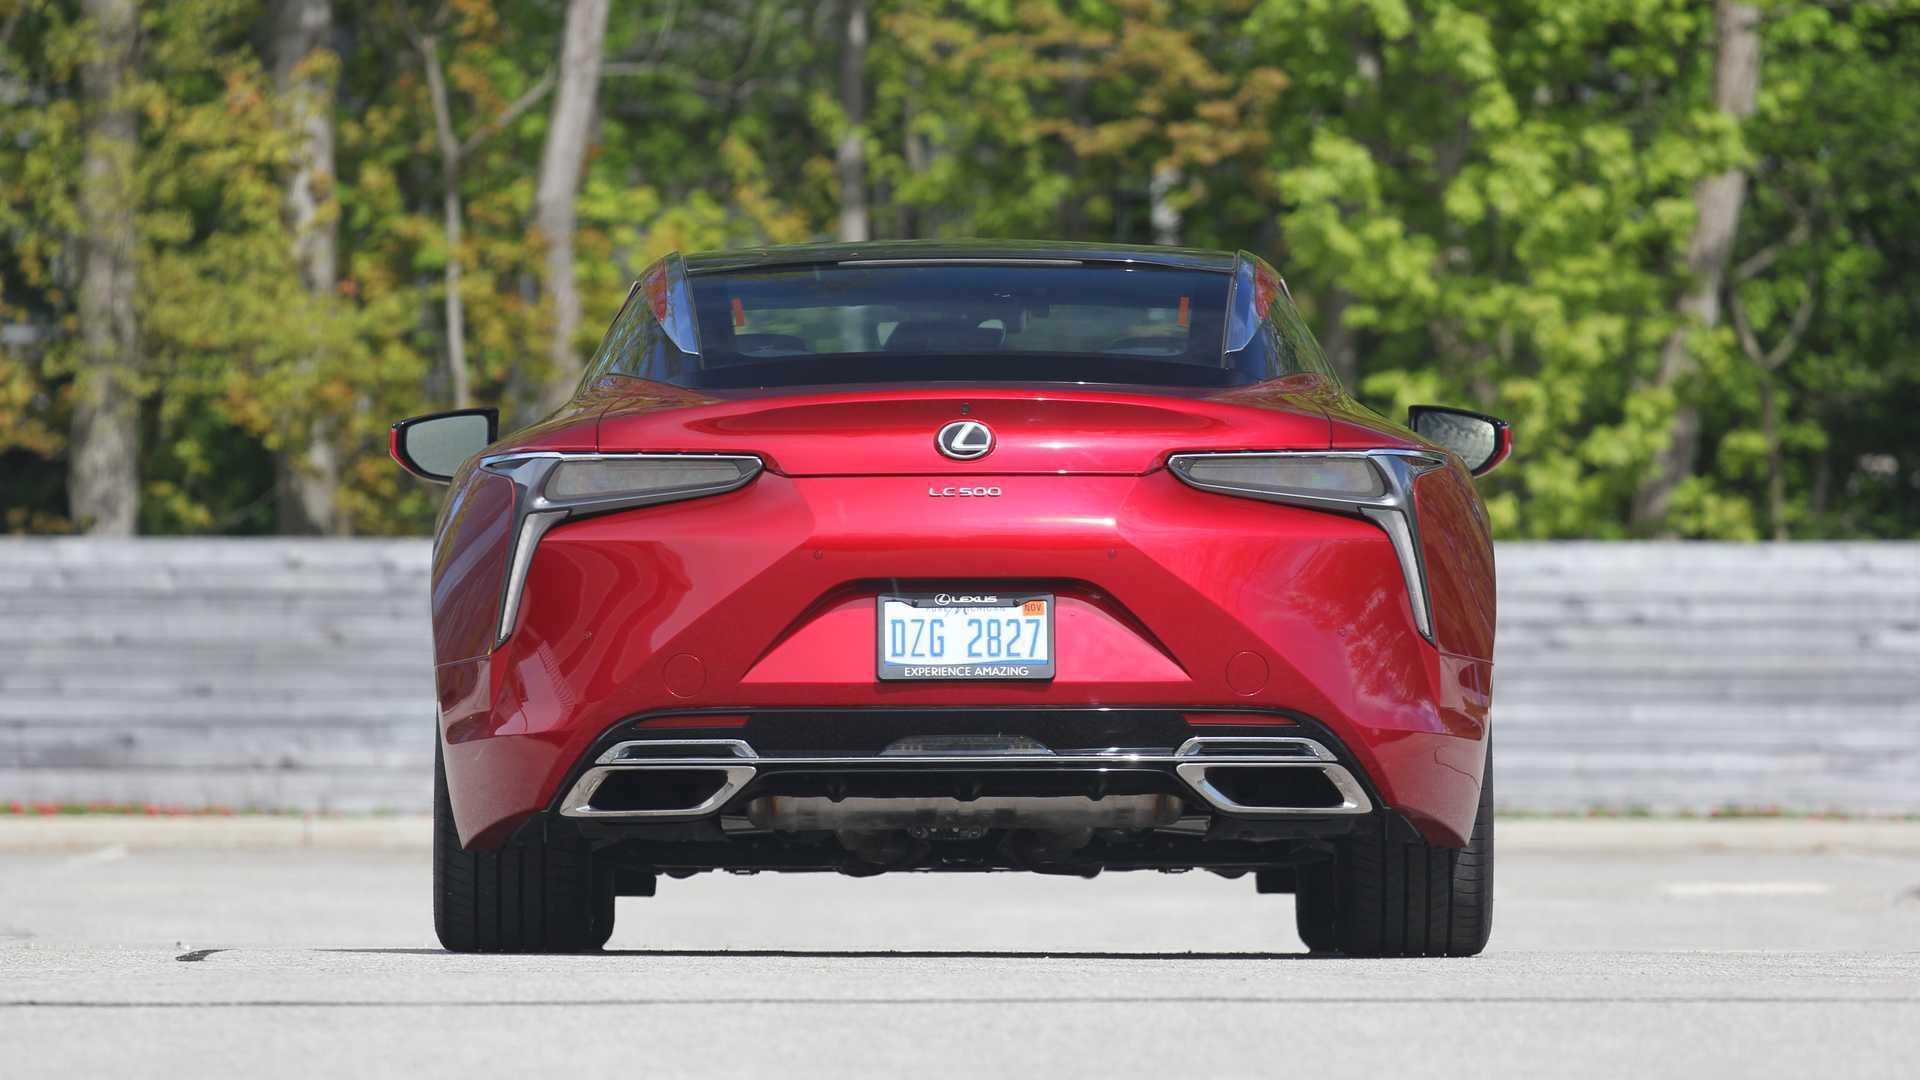 2019 Lexus Lc 500 Pros And Cons